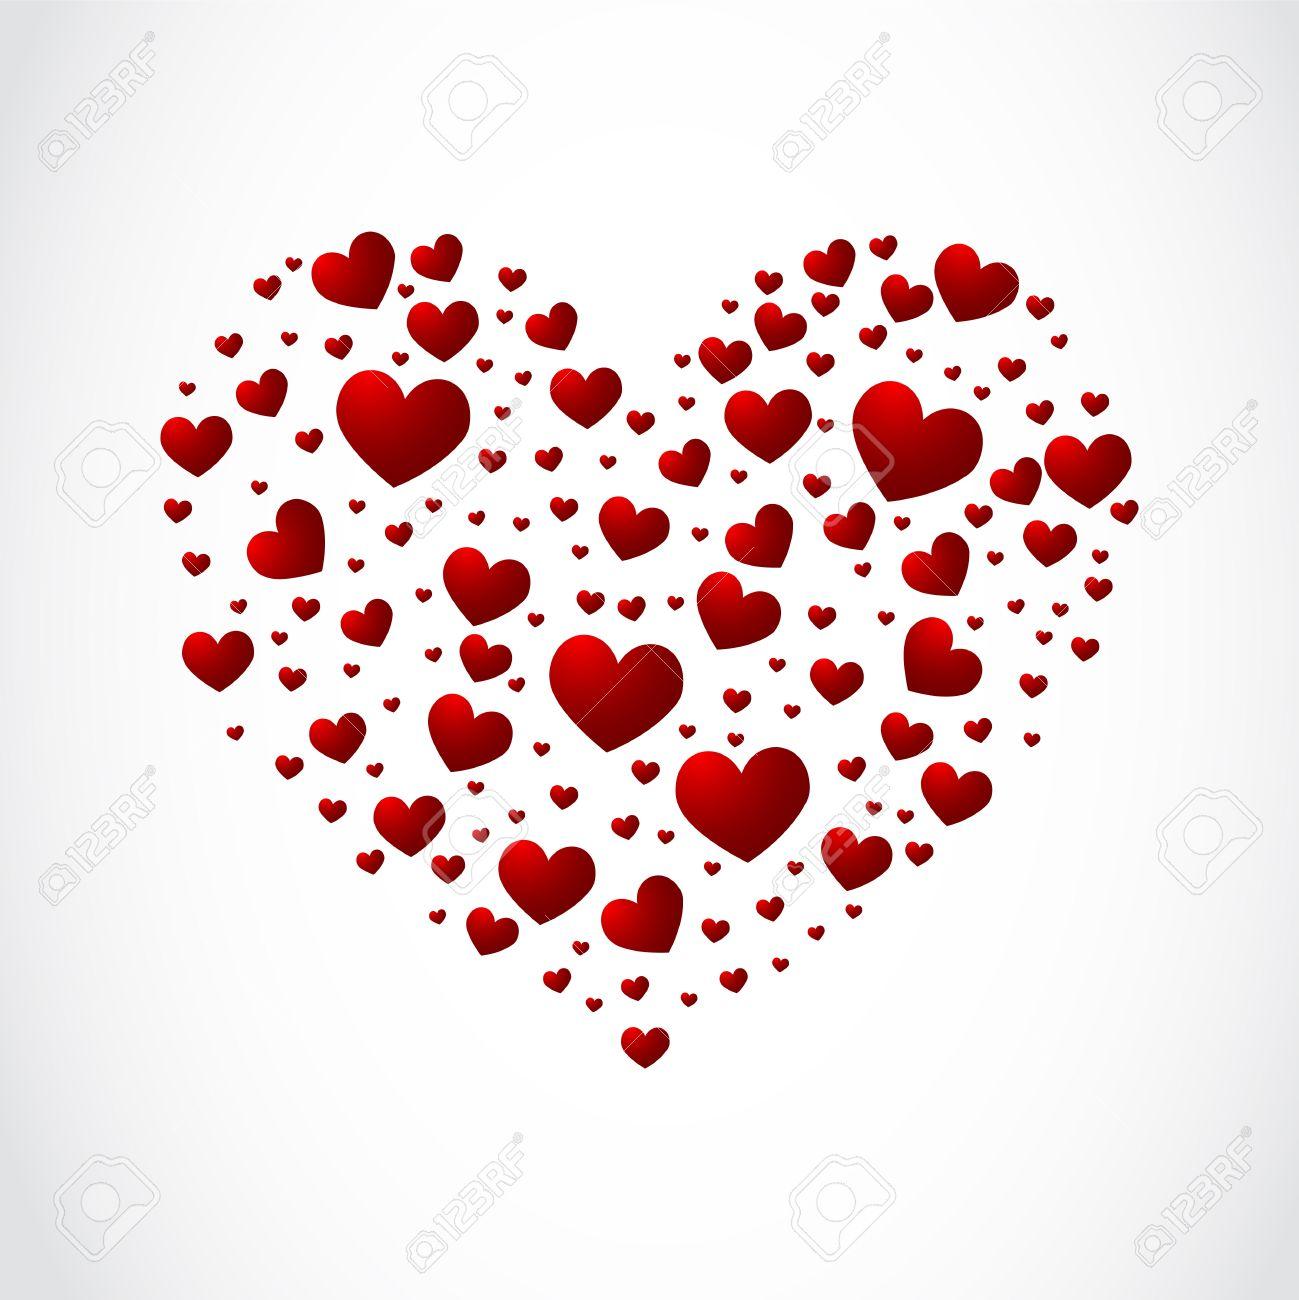 Heart made of small hearts Stock Vector - 11893492